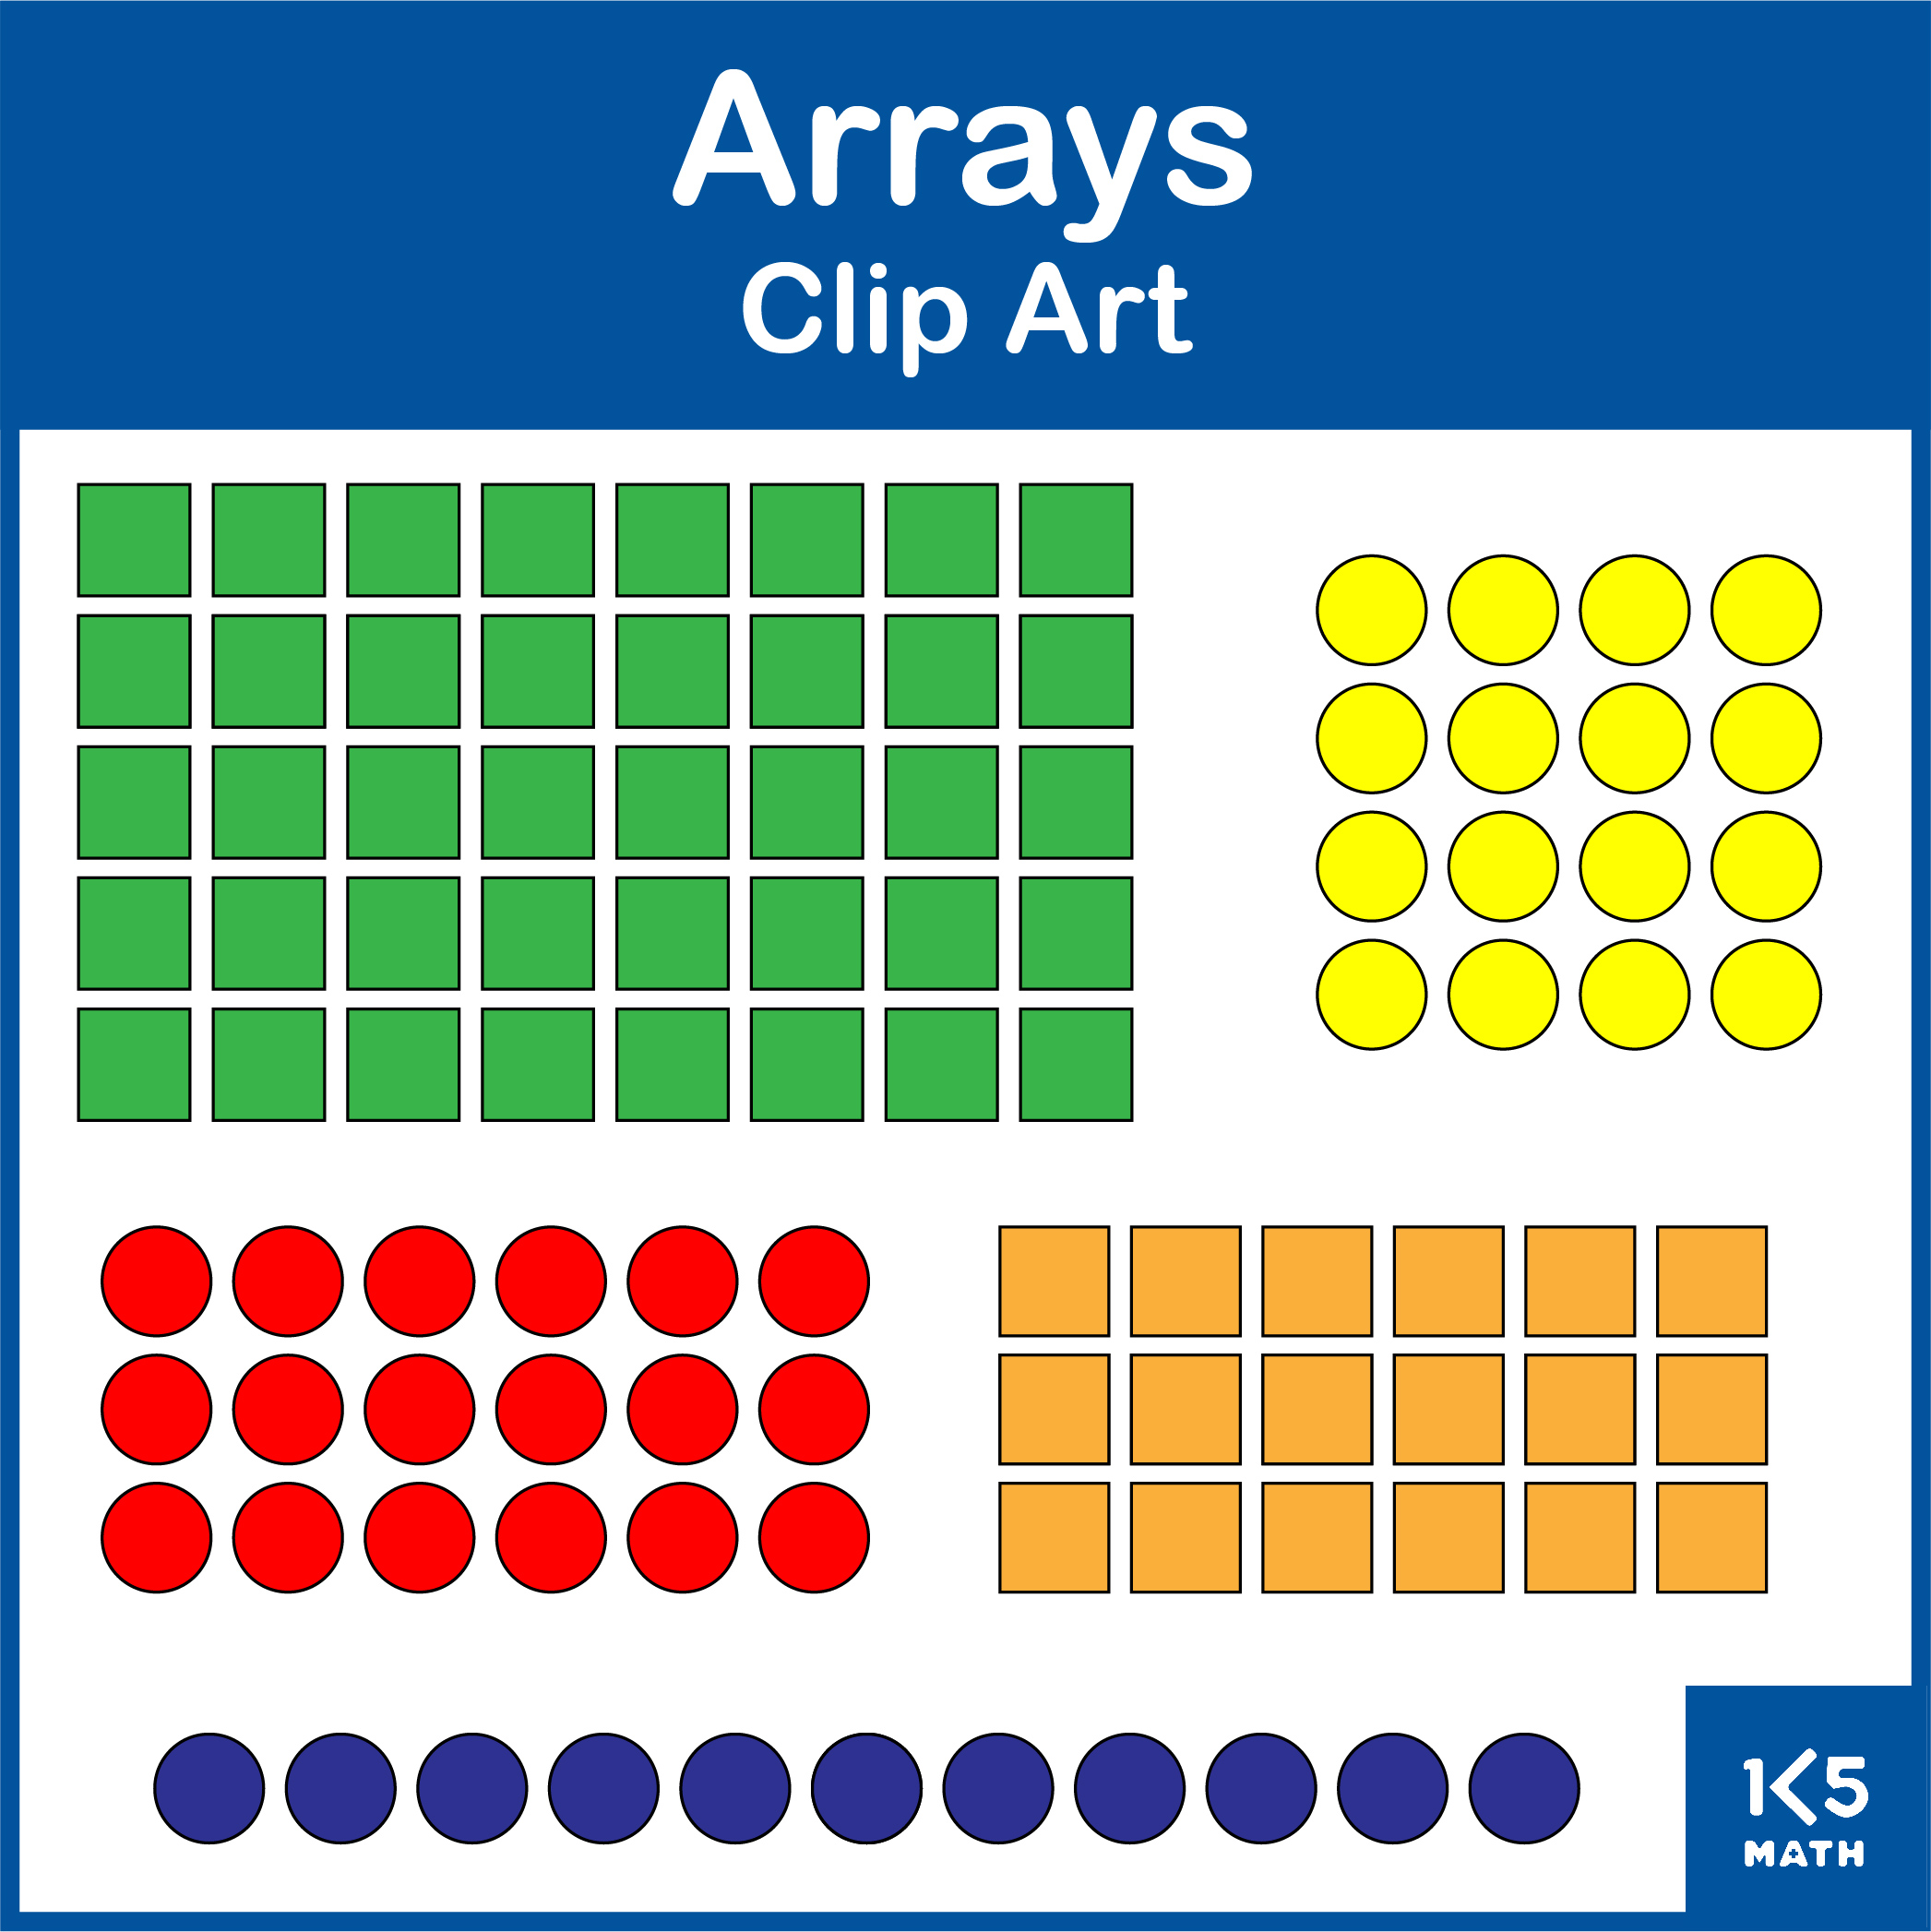 Arrays Clip Art